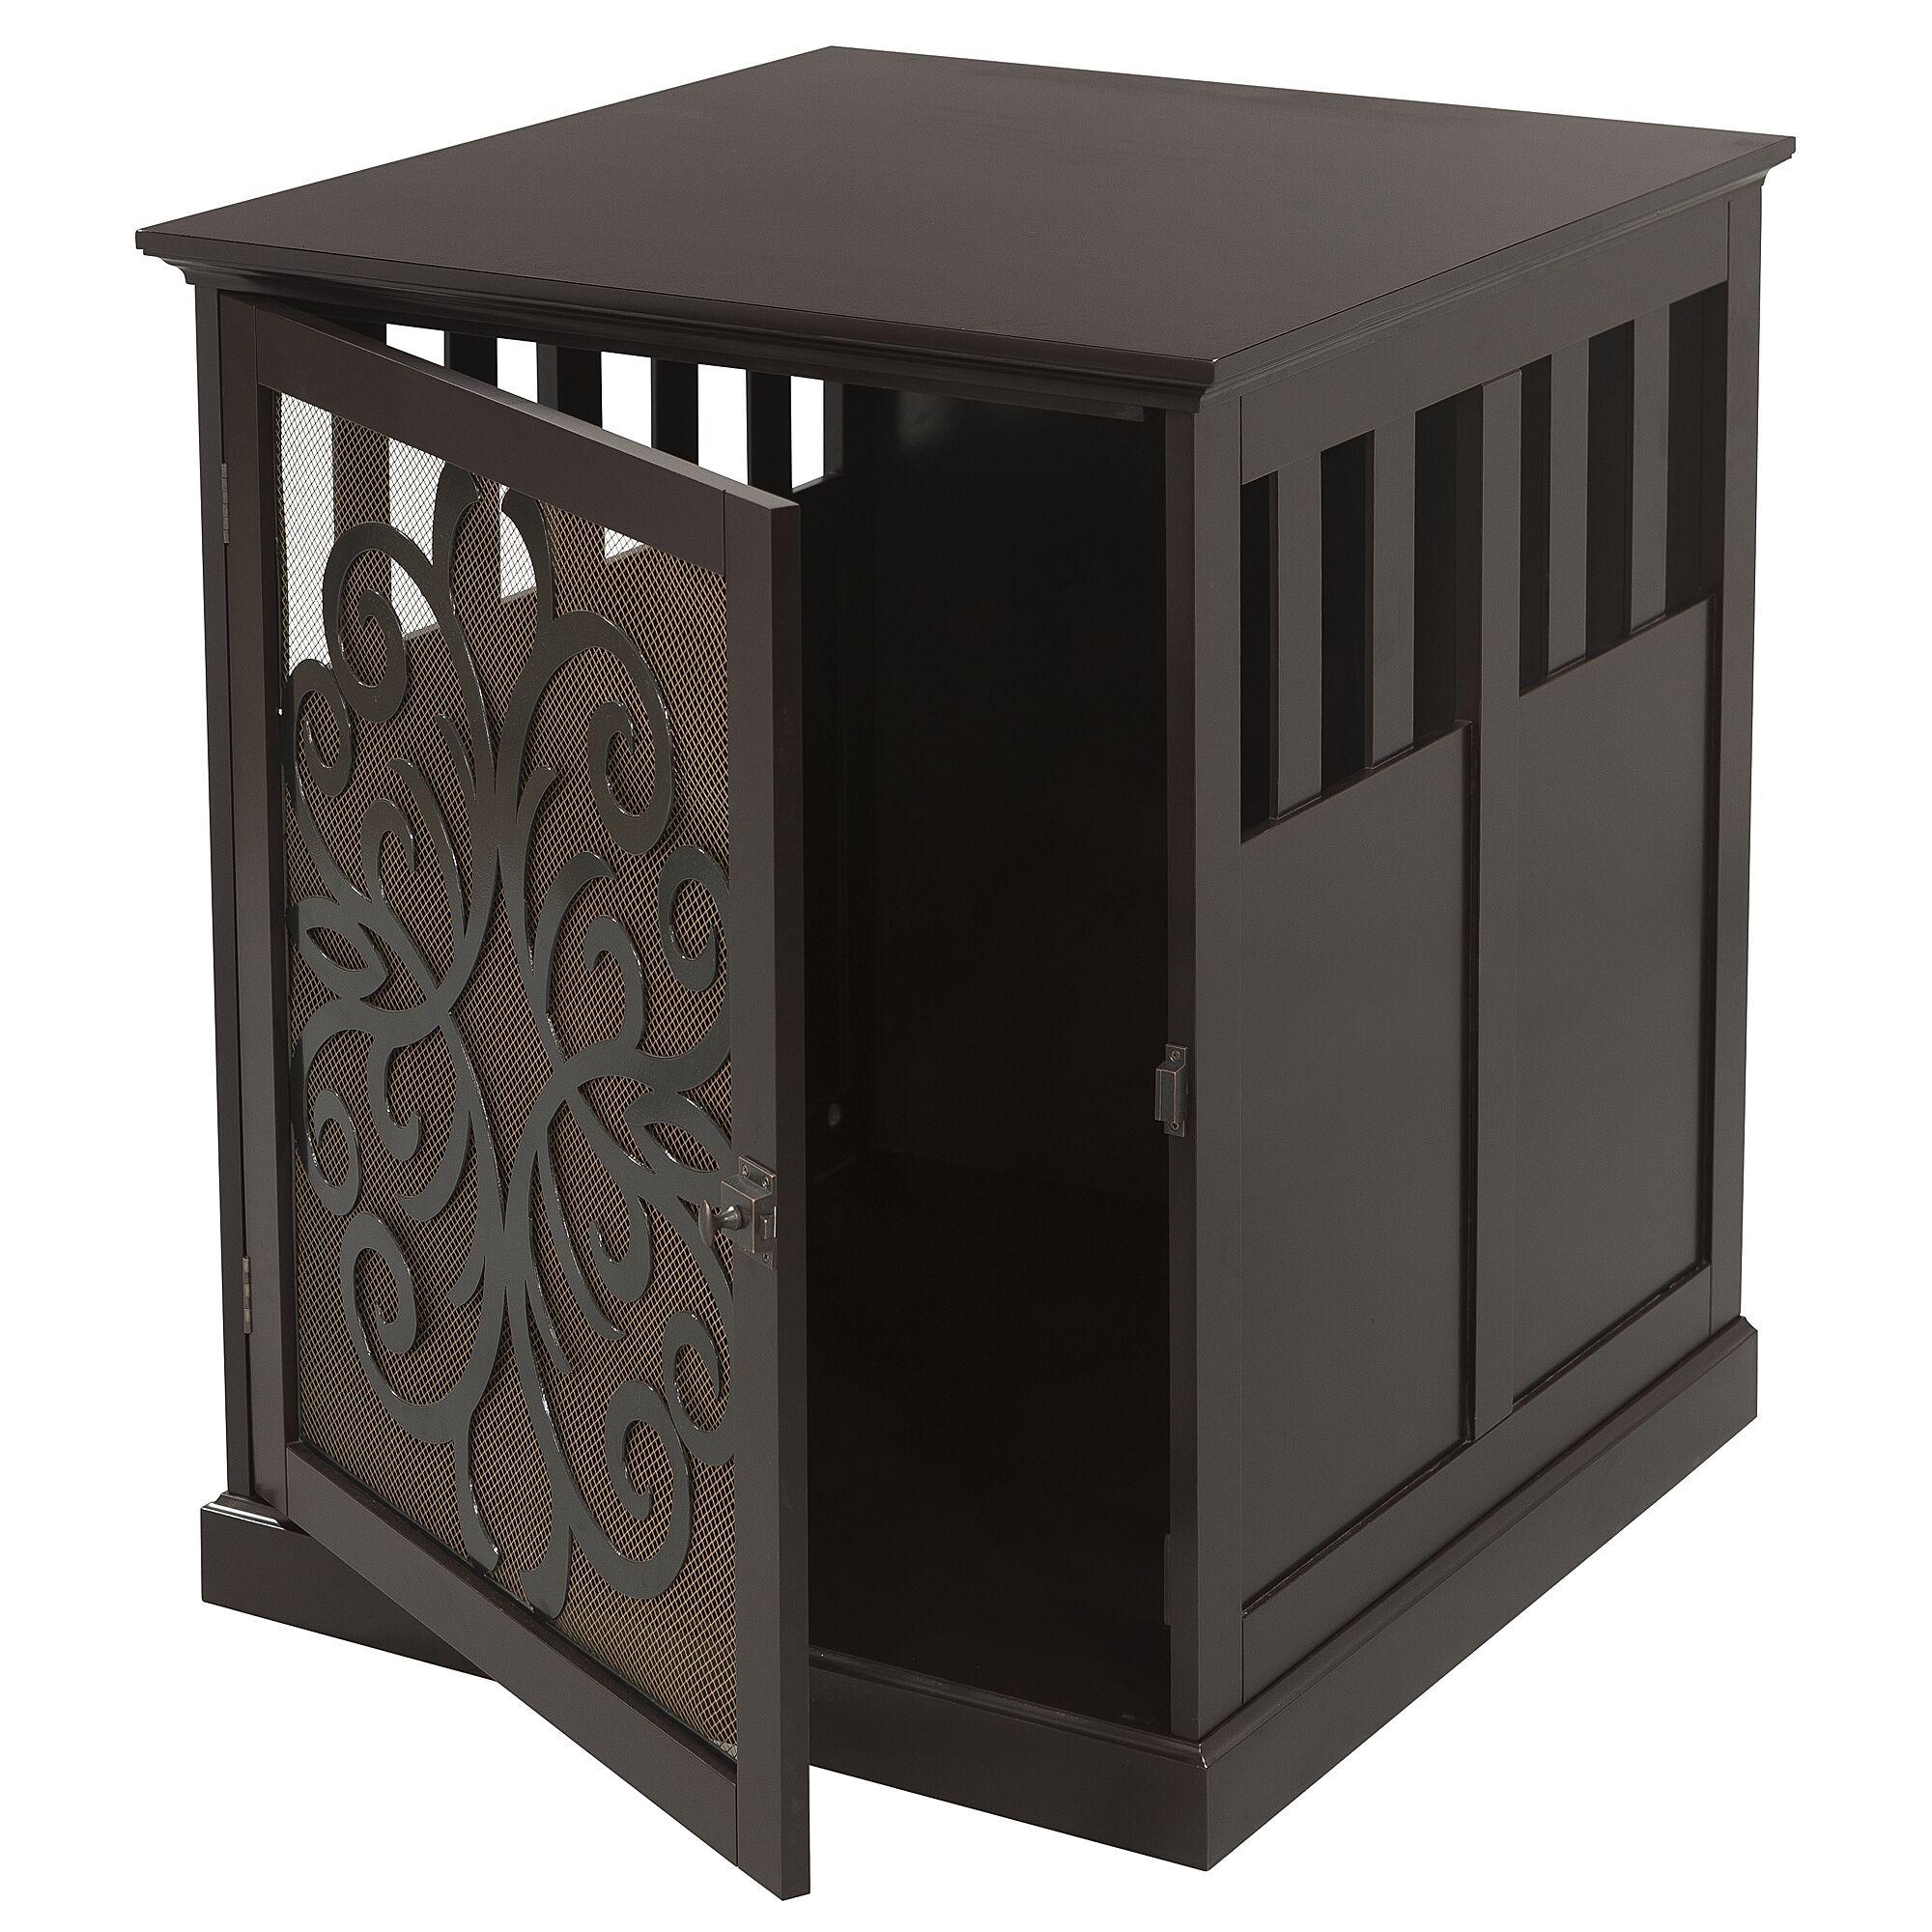 Arya Buddy Residence Pet Crate Size: Medium (26.5